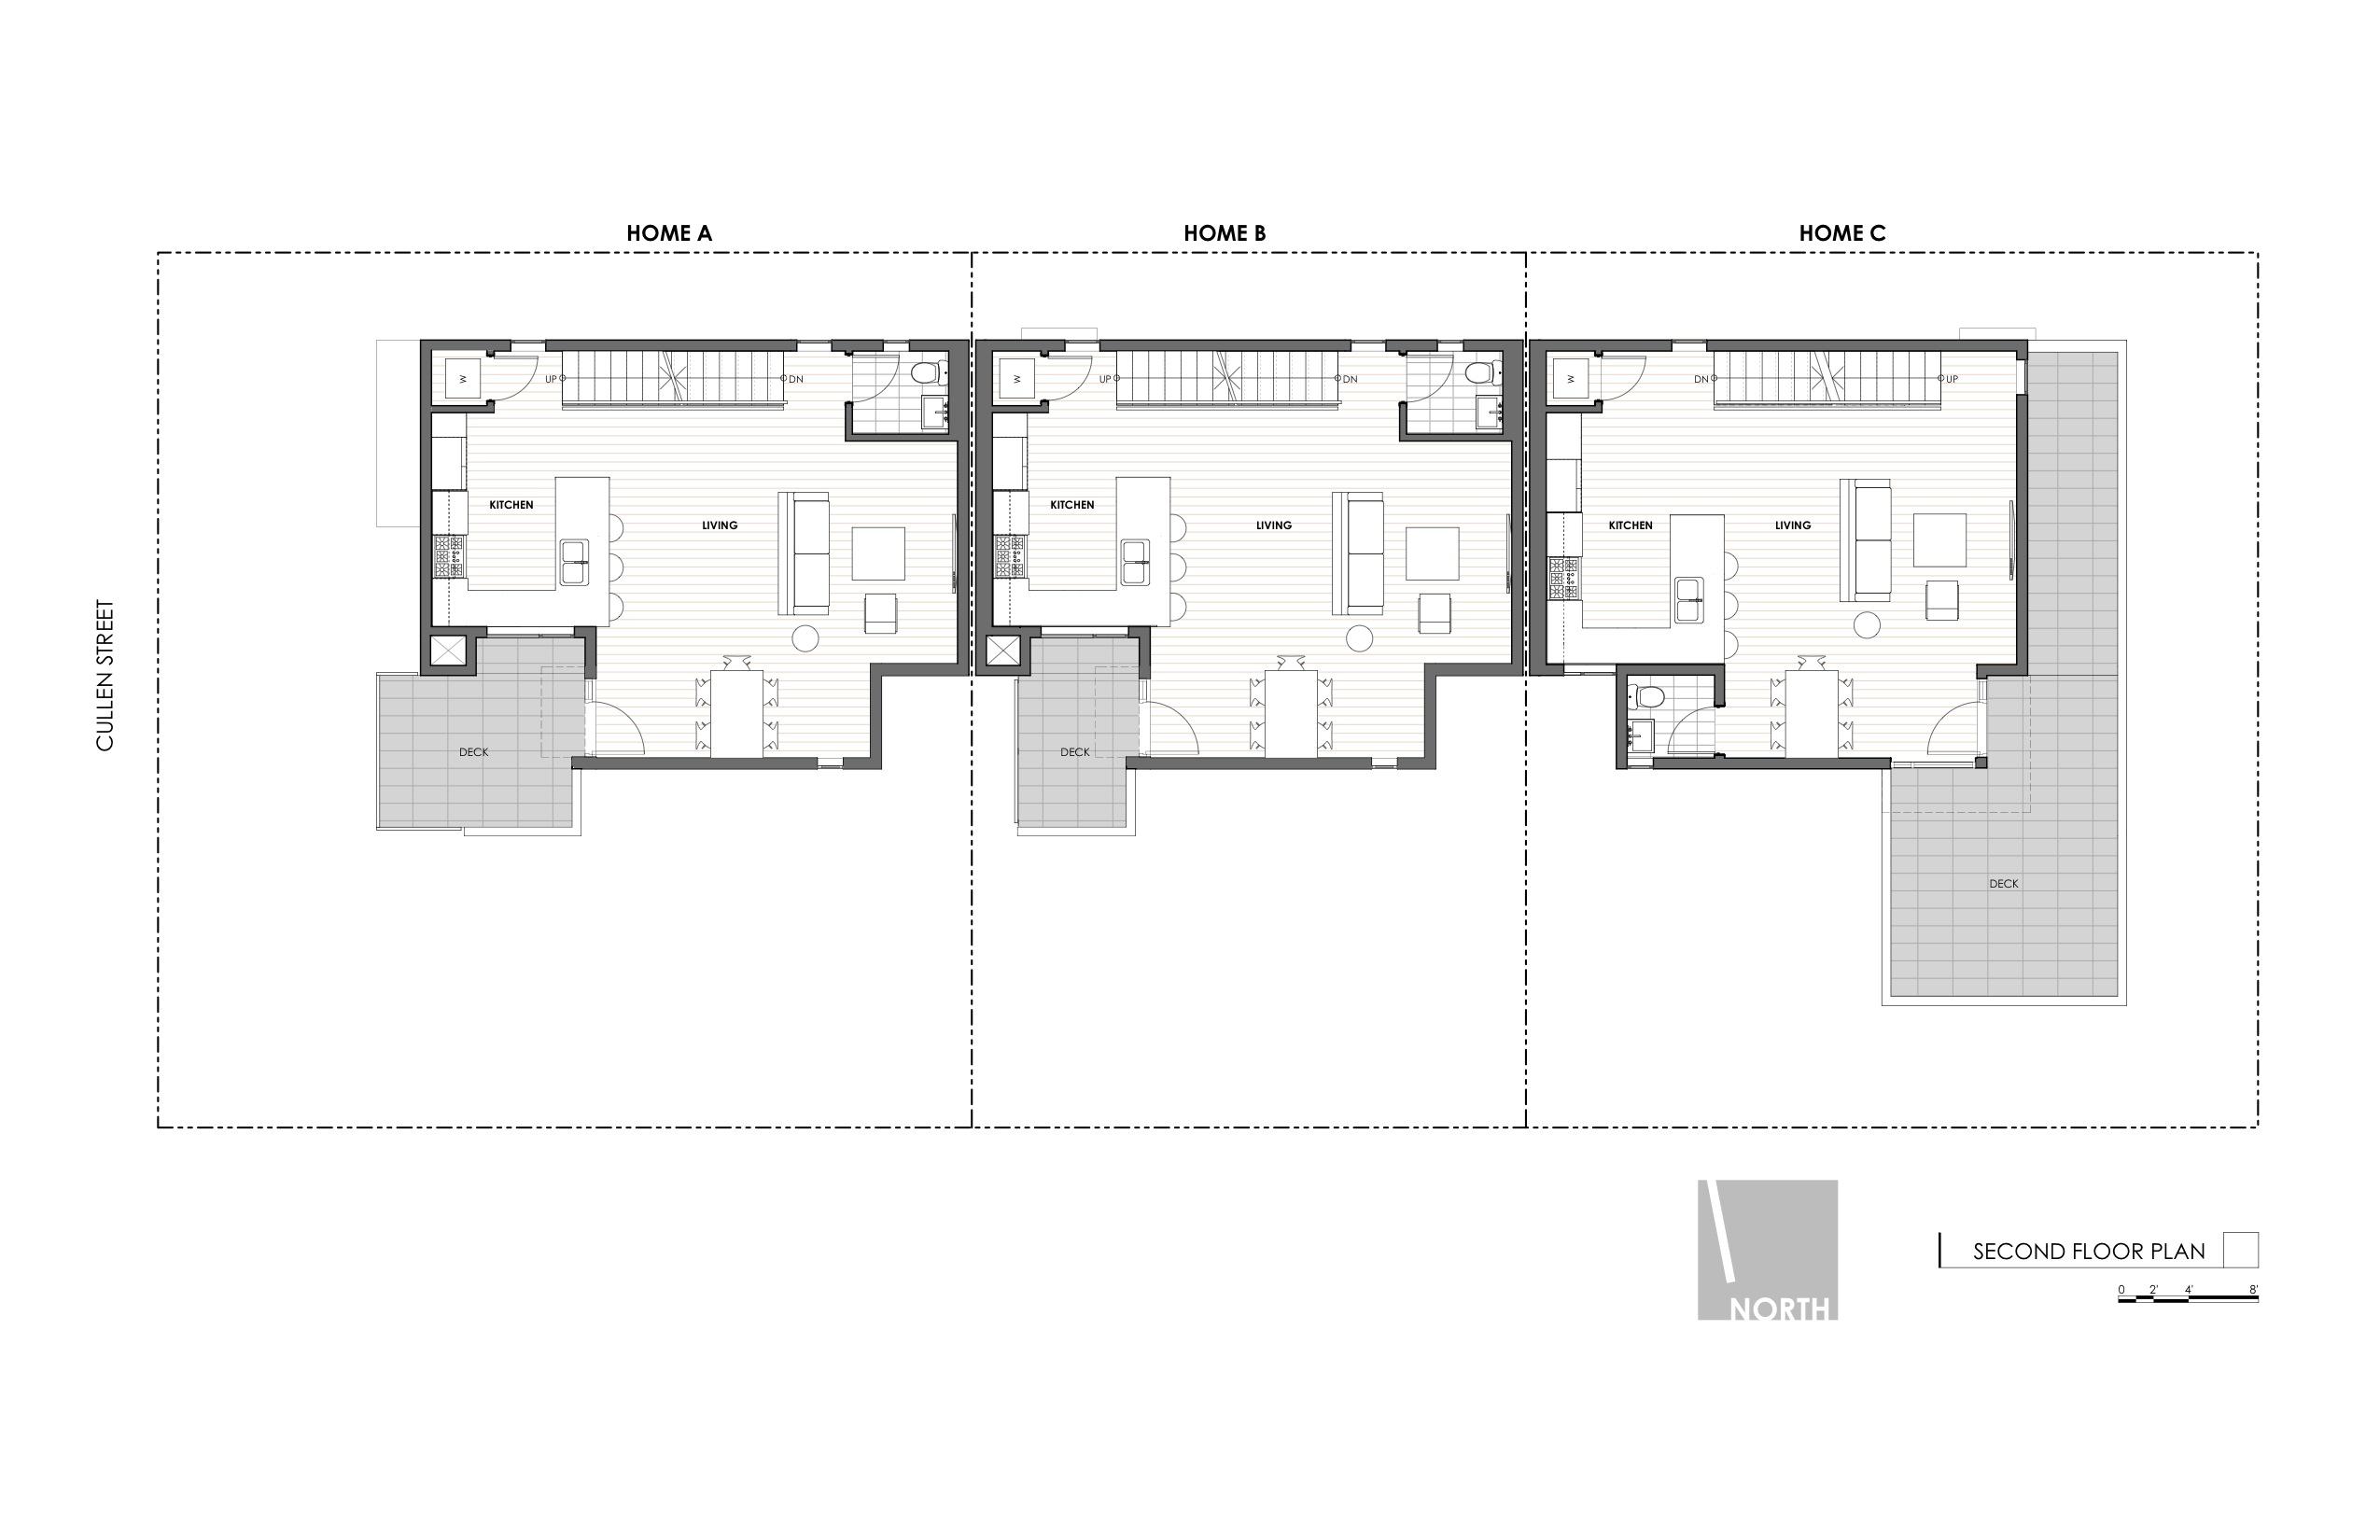 Art District Small Lot Homes Cullen 2nd Floor Plan